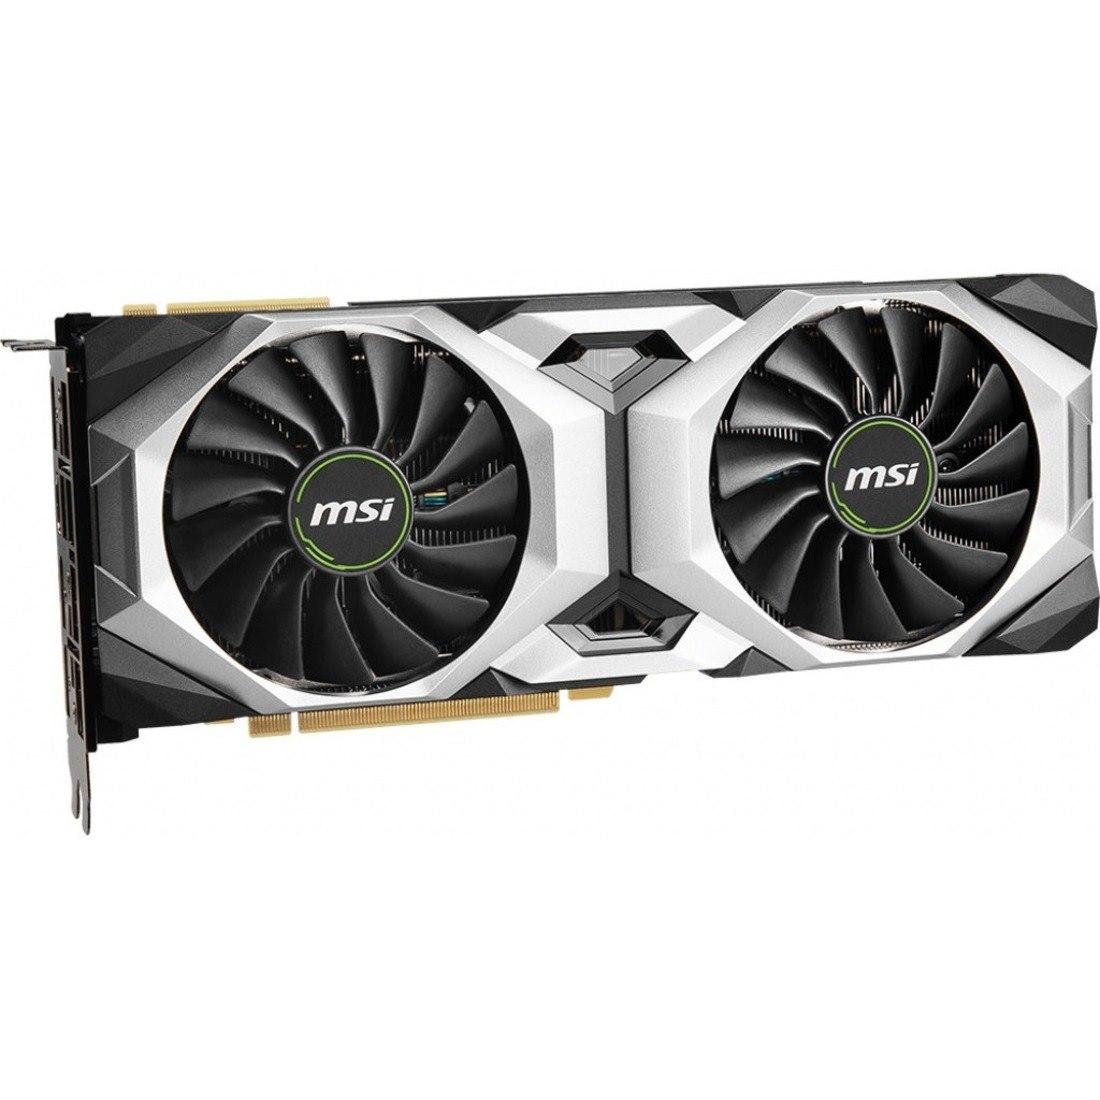 MSI VENTUS GeForce RTX 2080 SUPER VENTUS OC GeForce RTX 2080 SUPER Graphic Card - 8 GB GDDR6